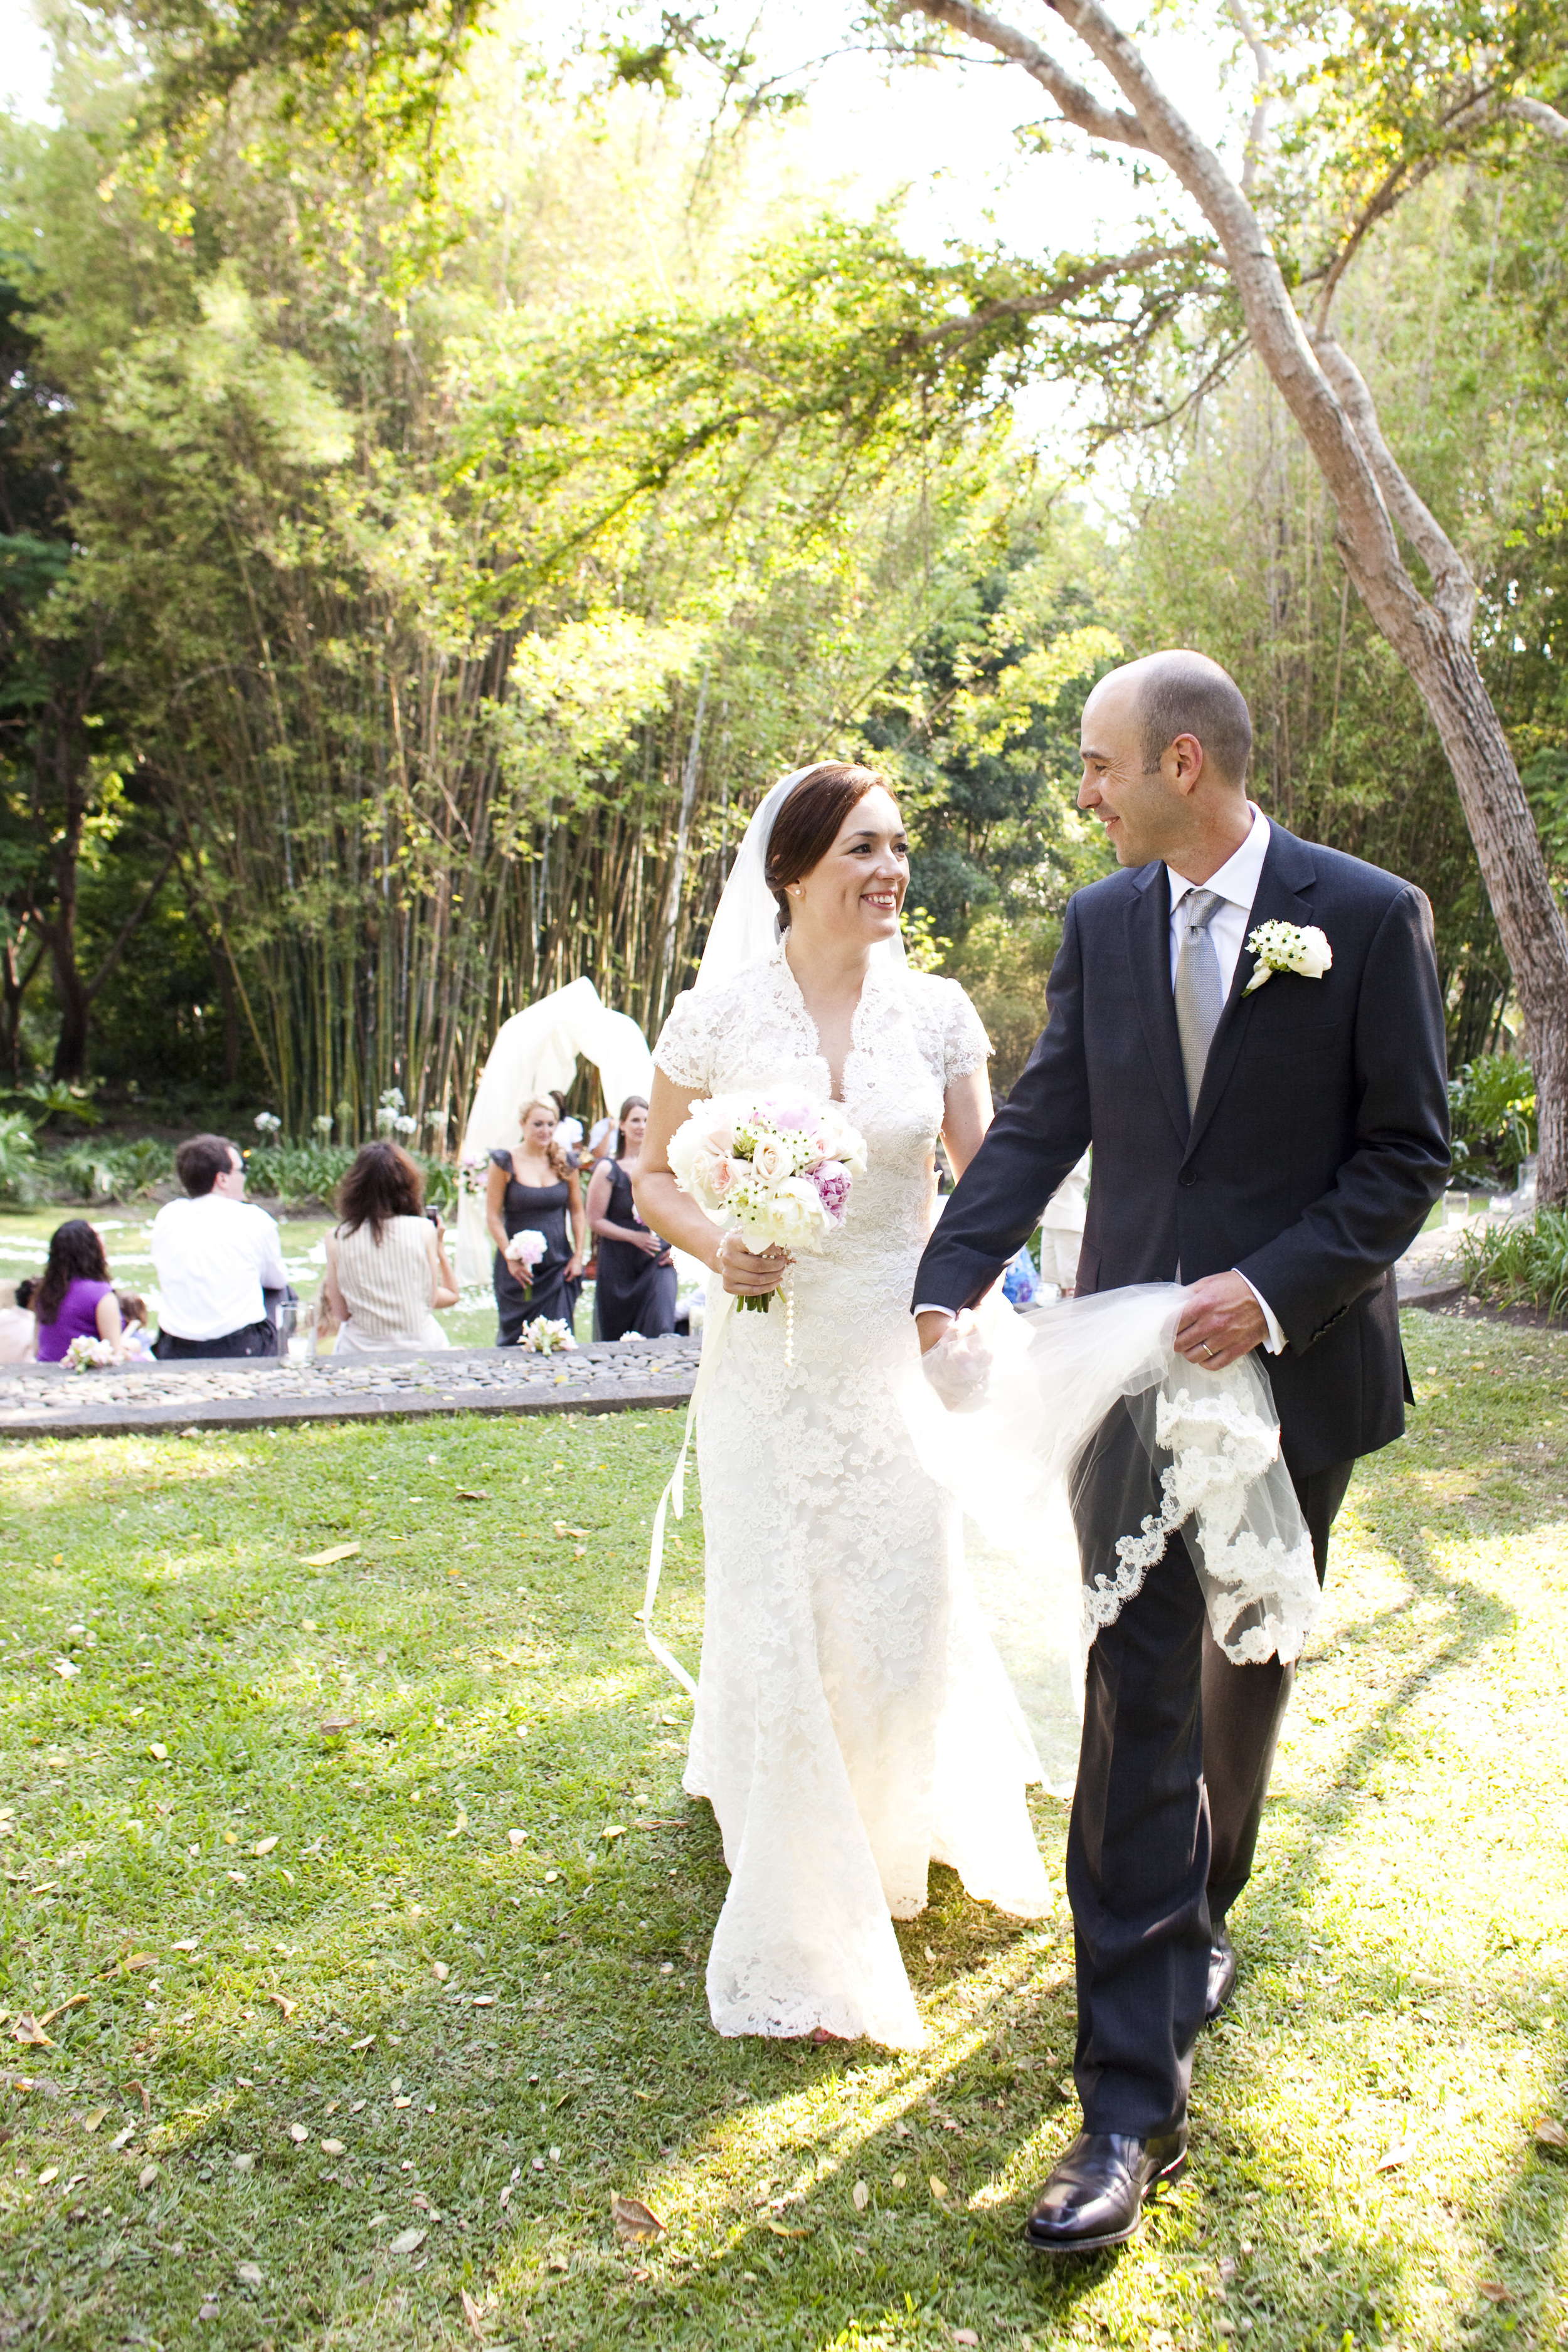 Ceci_New_York_Style_Luxury_Custom_Mexico_Wedding_CeciBride_Letterpress_NewYork_Foil_Hacienda_de_San_Antonio_26.jpg